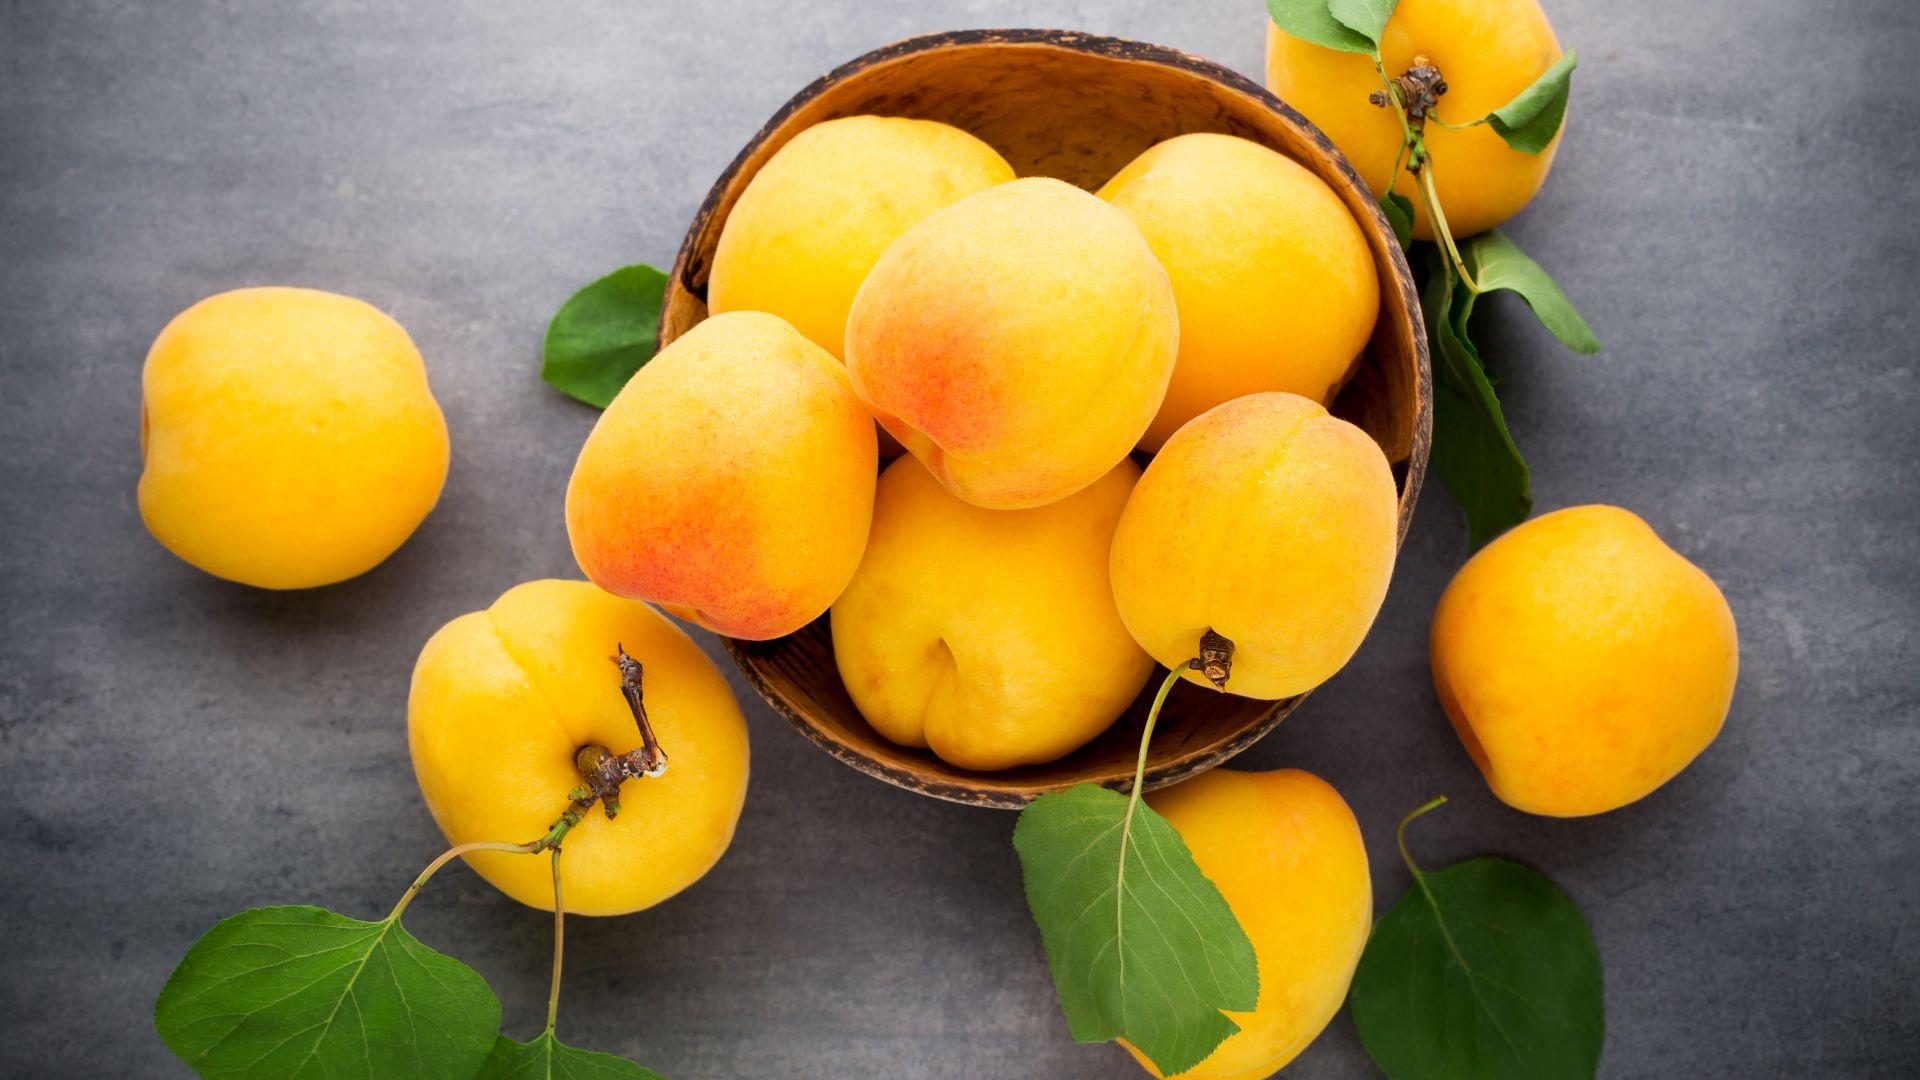 Wallpaper Apricot, yellow fruits, basket, leaves